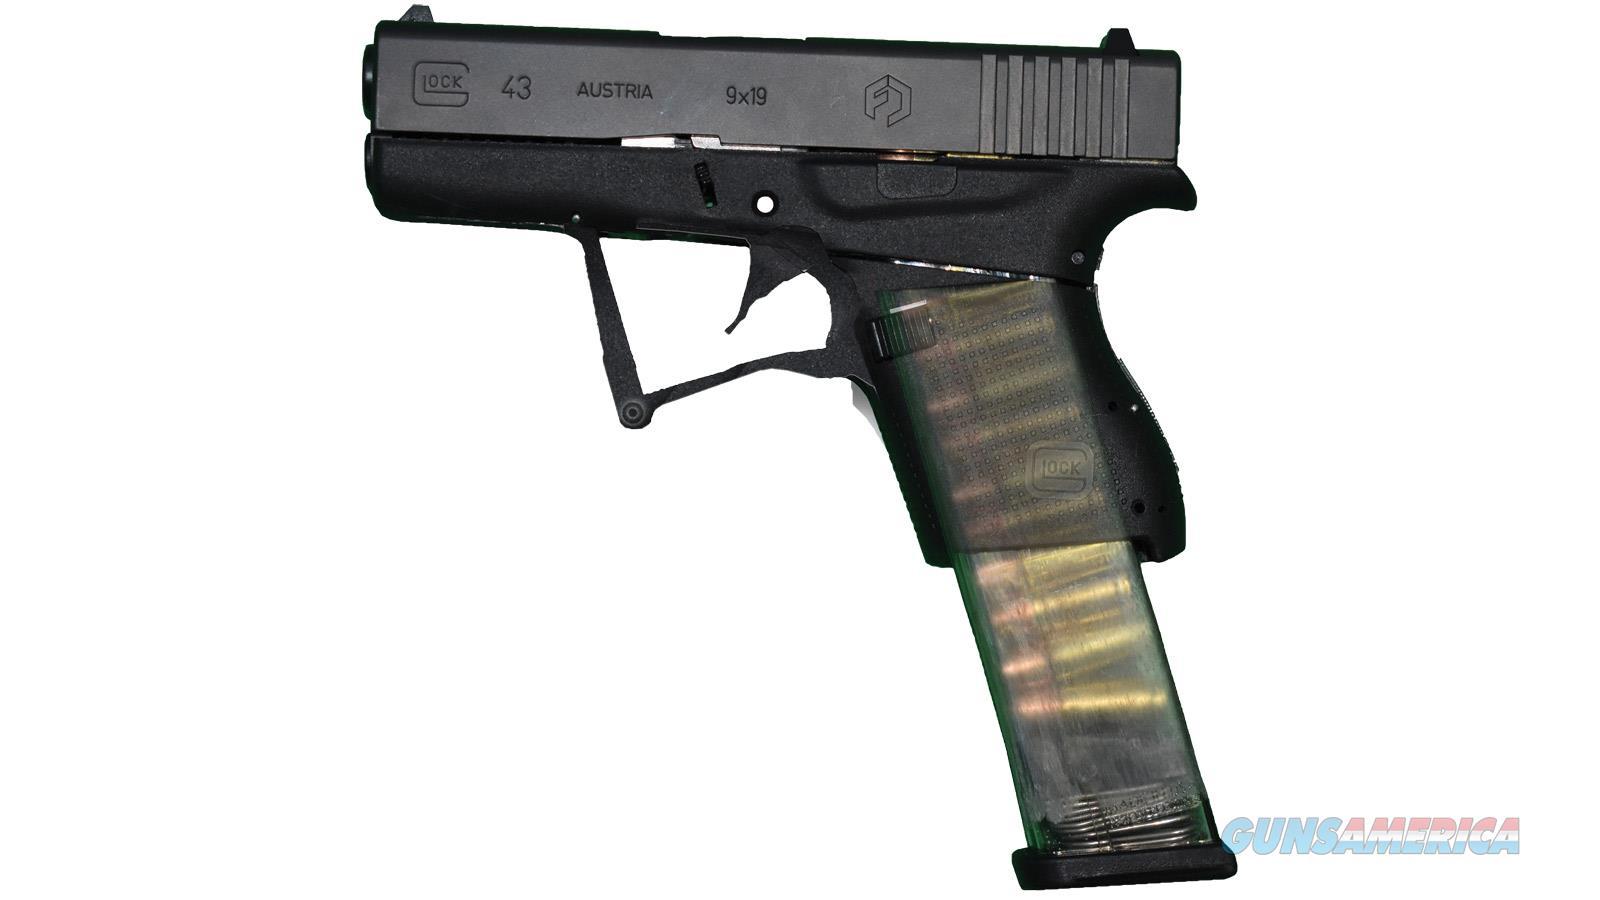 Full Conceal Conceal M3s Glock 43 9Mm Folding Pistol 10 Rounds Black M3G43  Guns > Pistols > F Misc Pistols